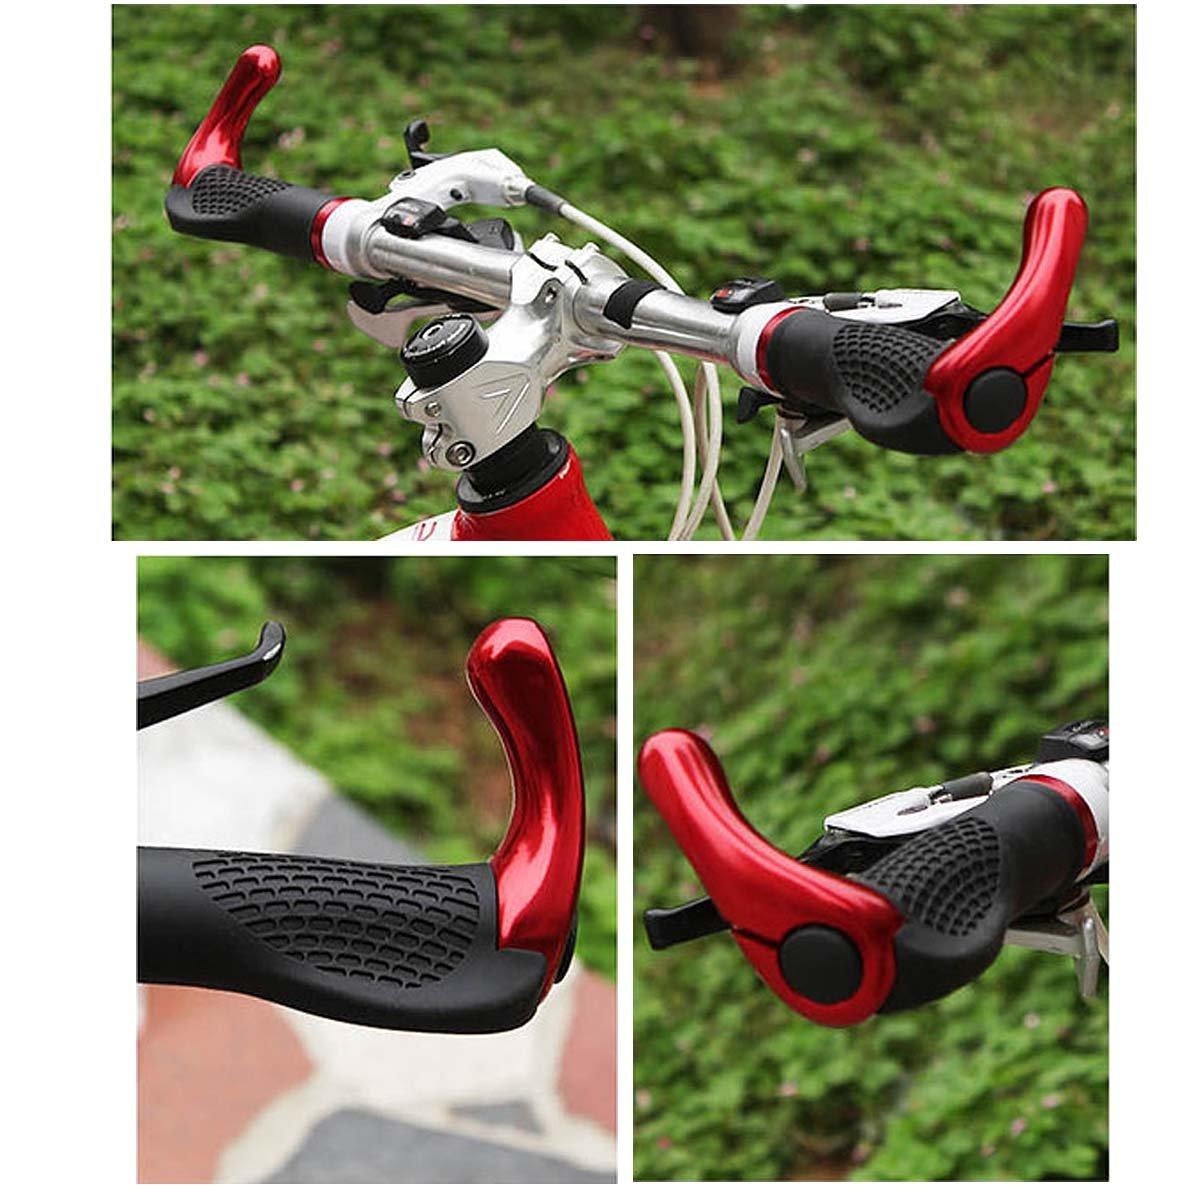 Kenthia Anti-slip Rubber Aluminum Alloy Bicycle Handlebar Grips Human Mechanics Design Blue by Kenthia (Image #5)